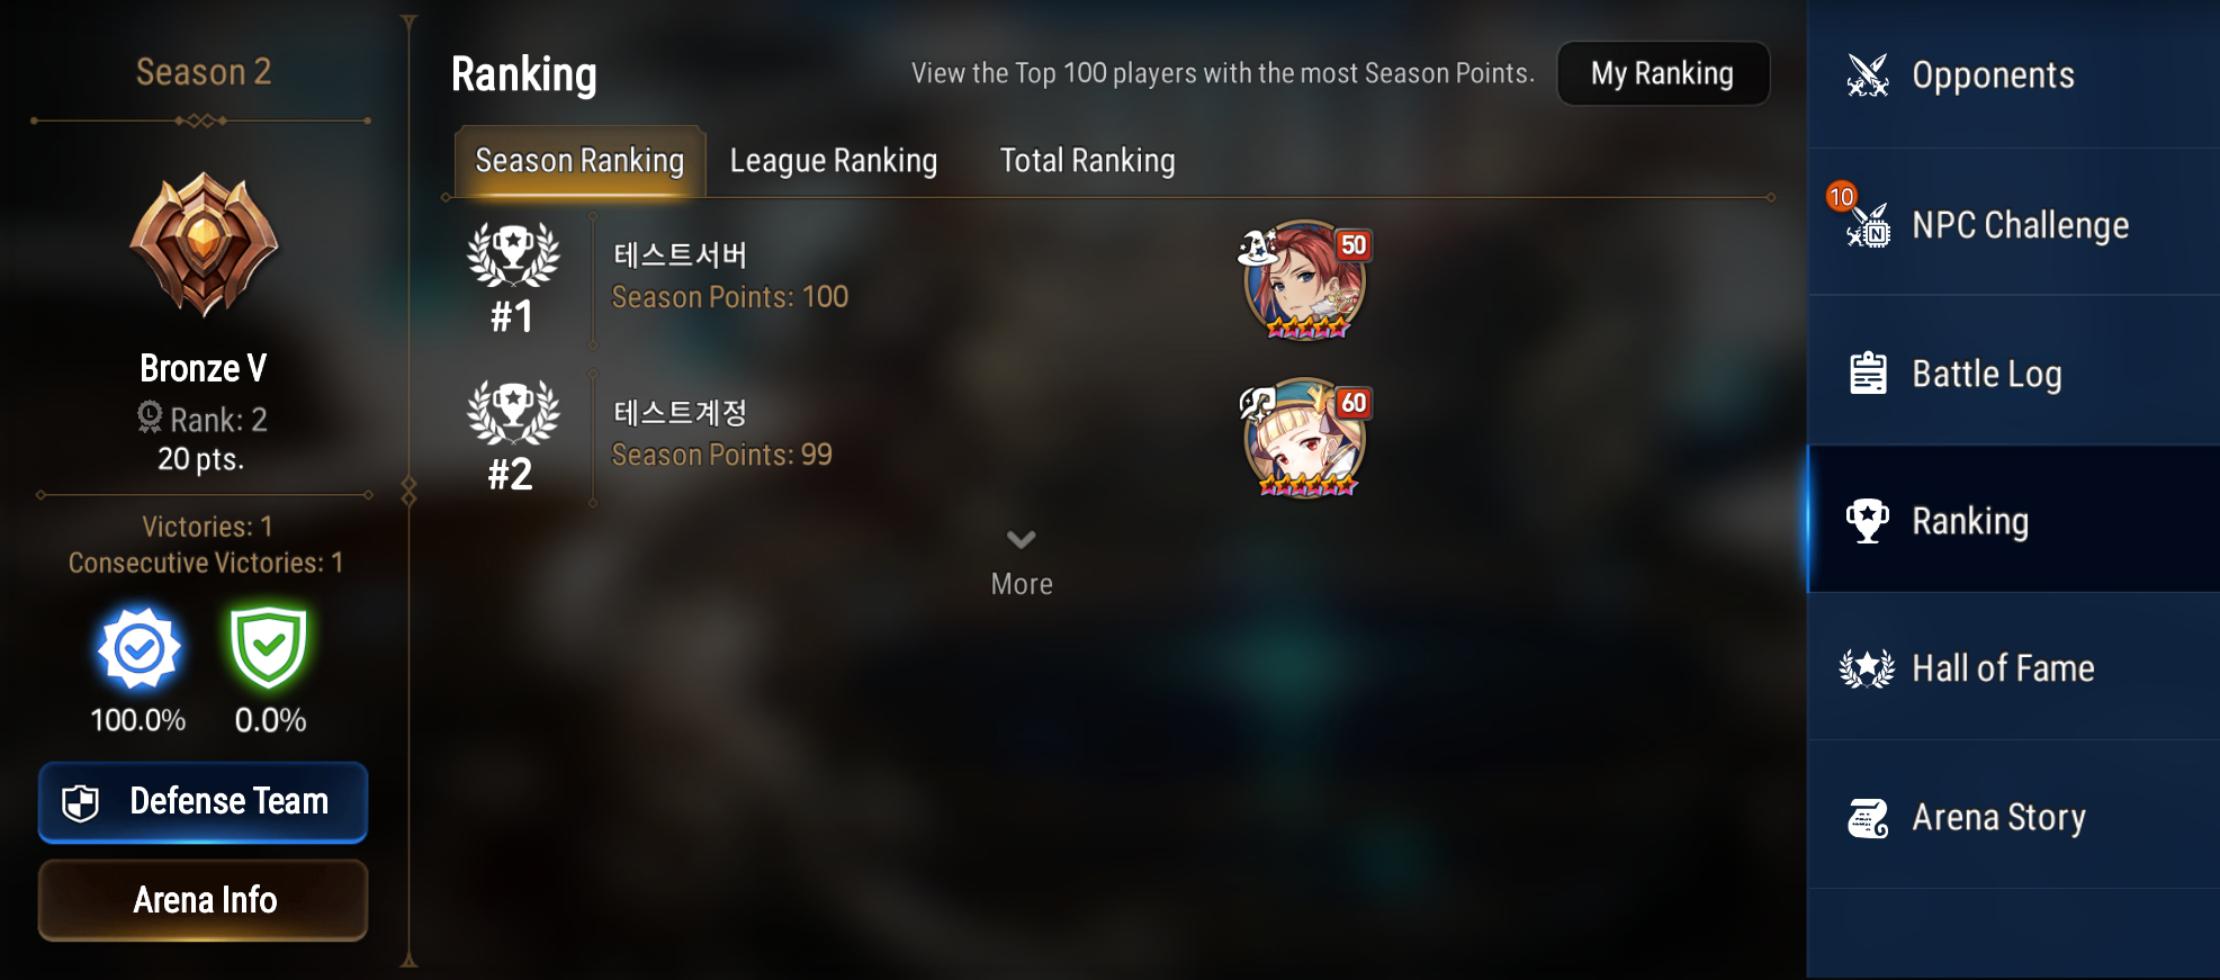 2 v 2 arena rankings